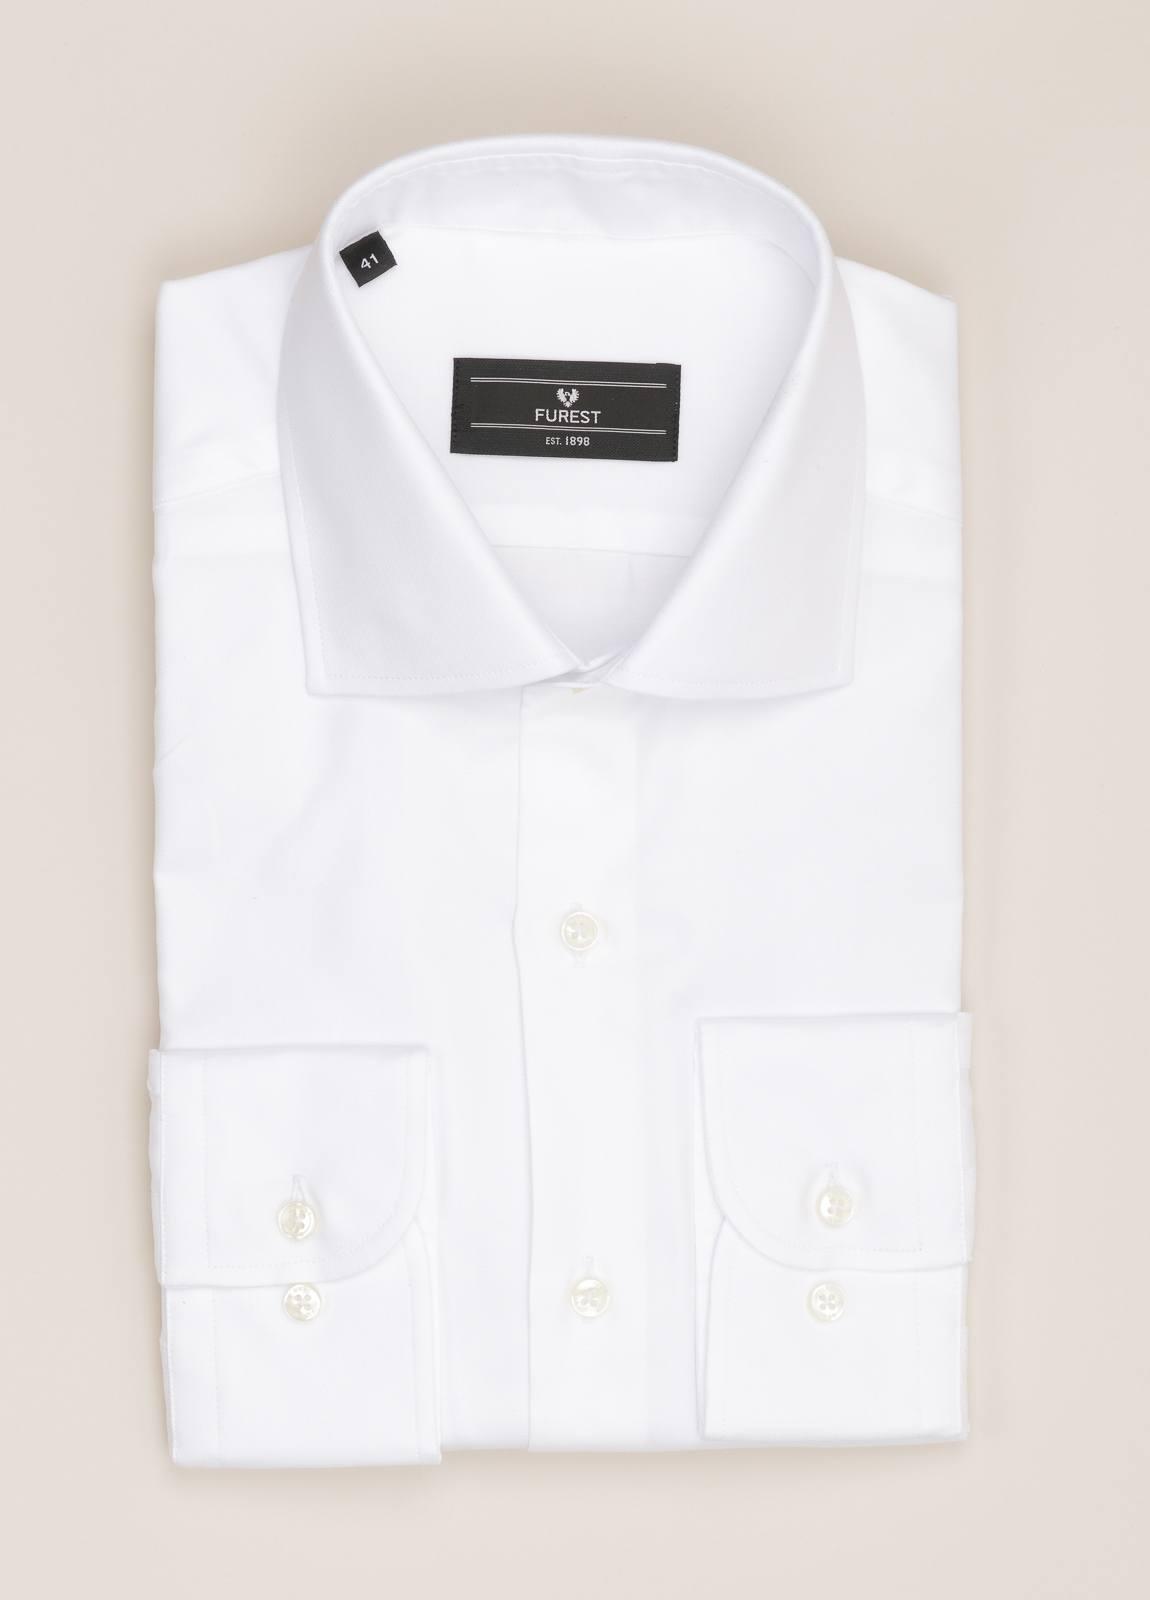 Camisa vestir FUREST COLECCIÓN REGULAR FIT blanco